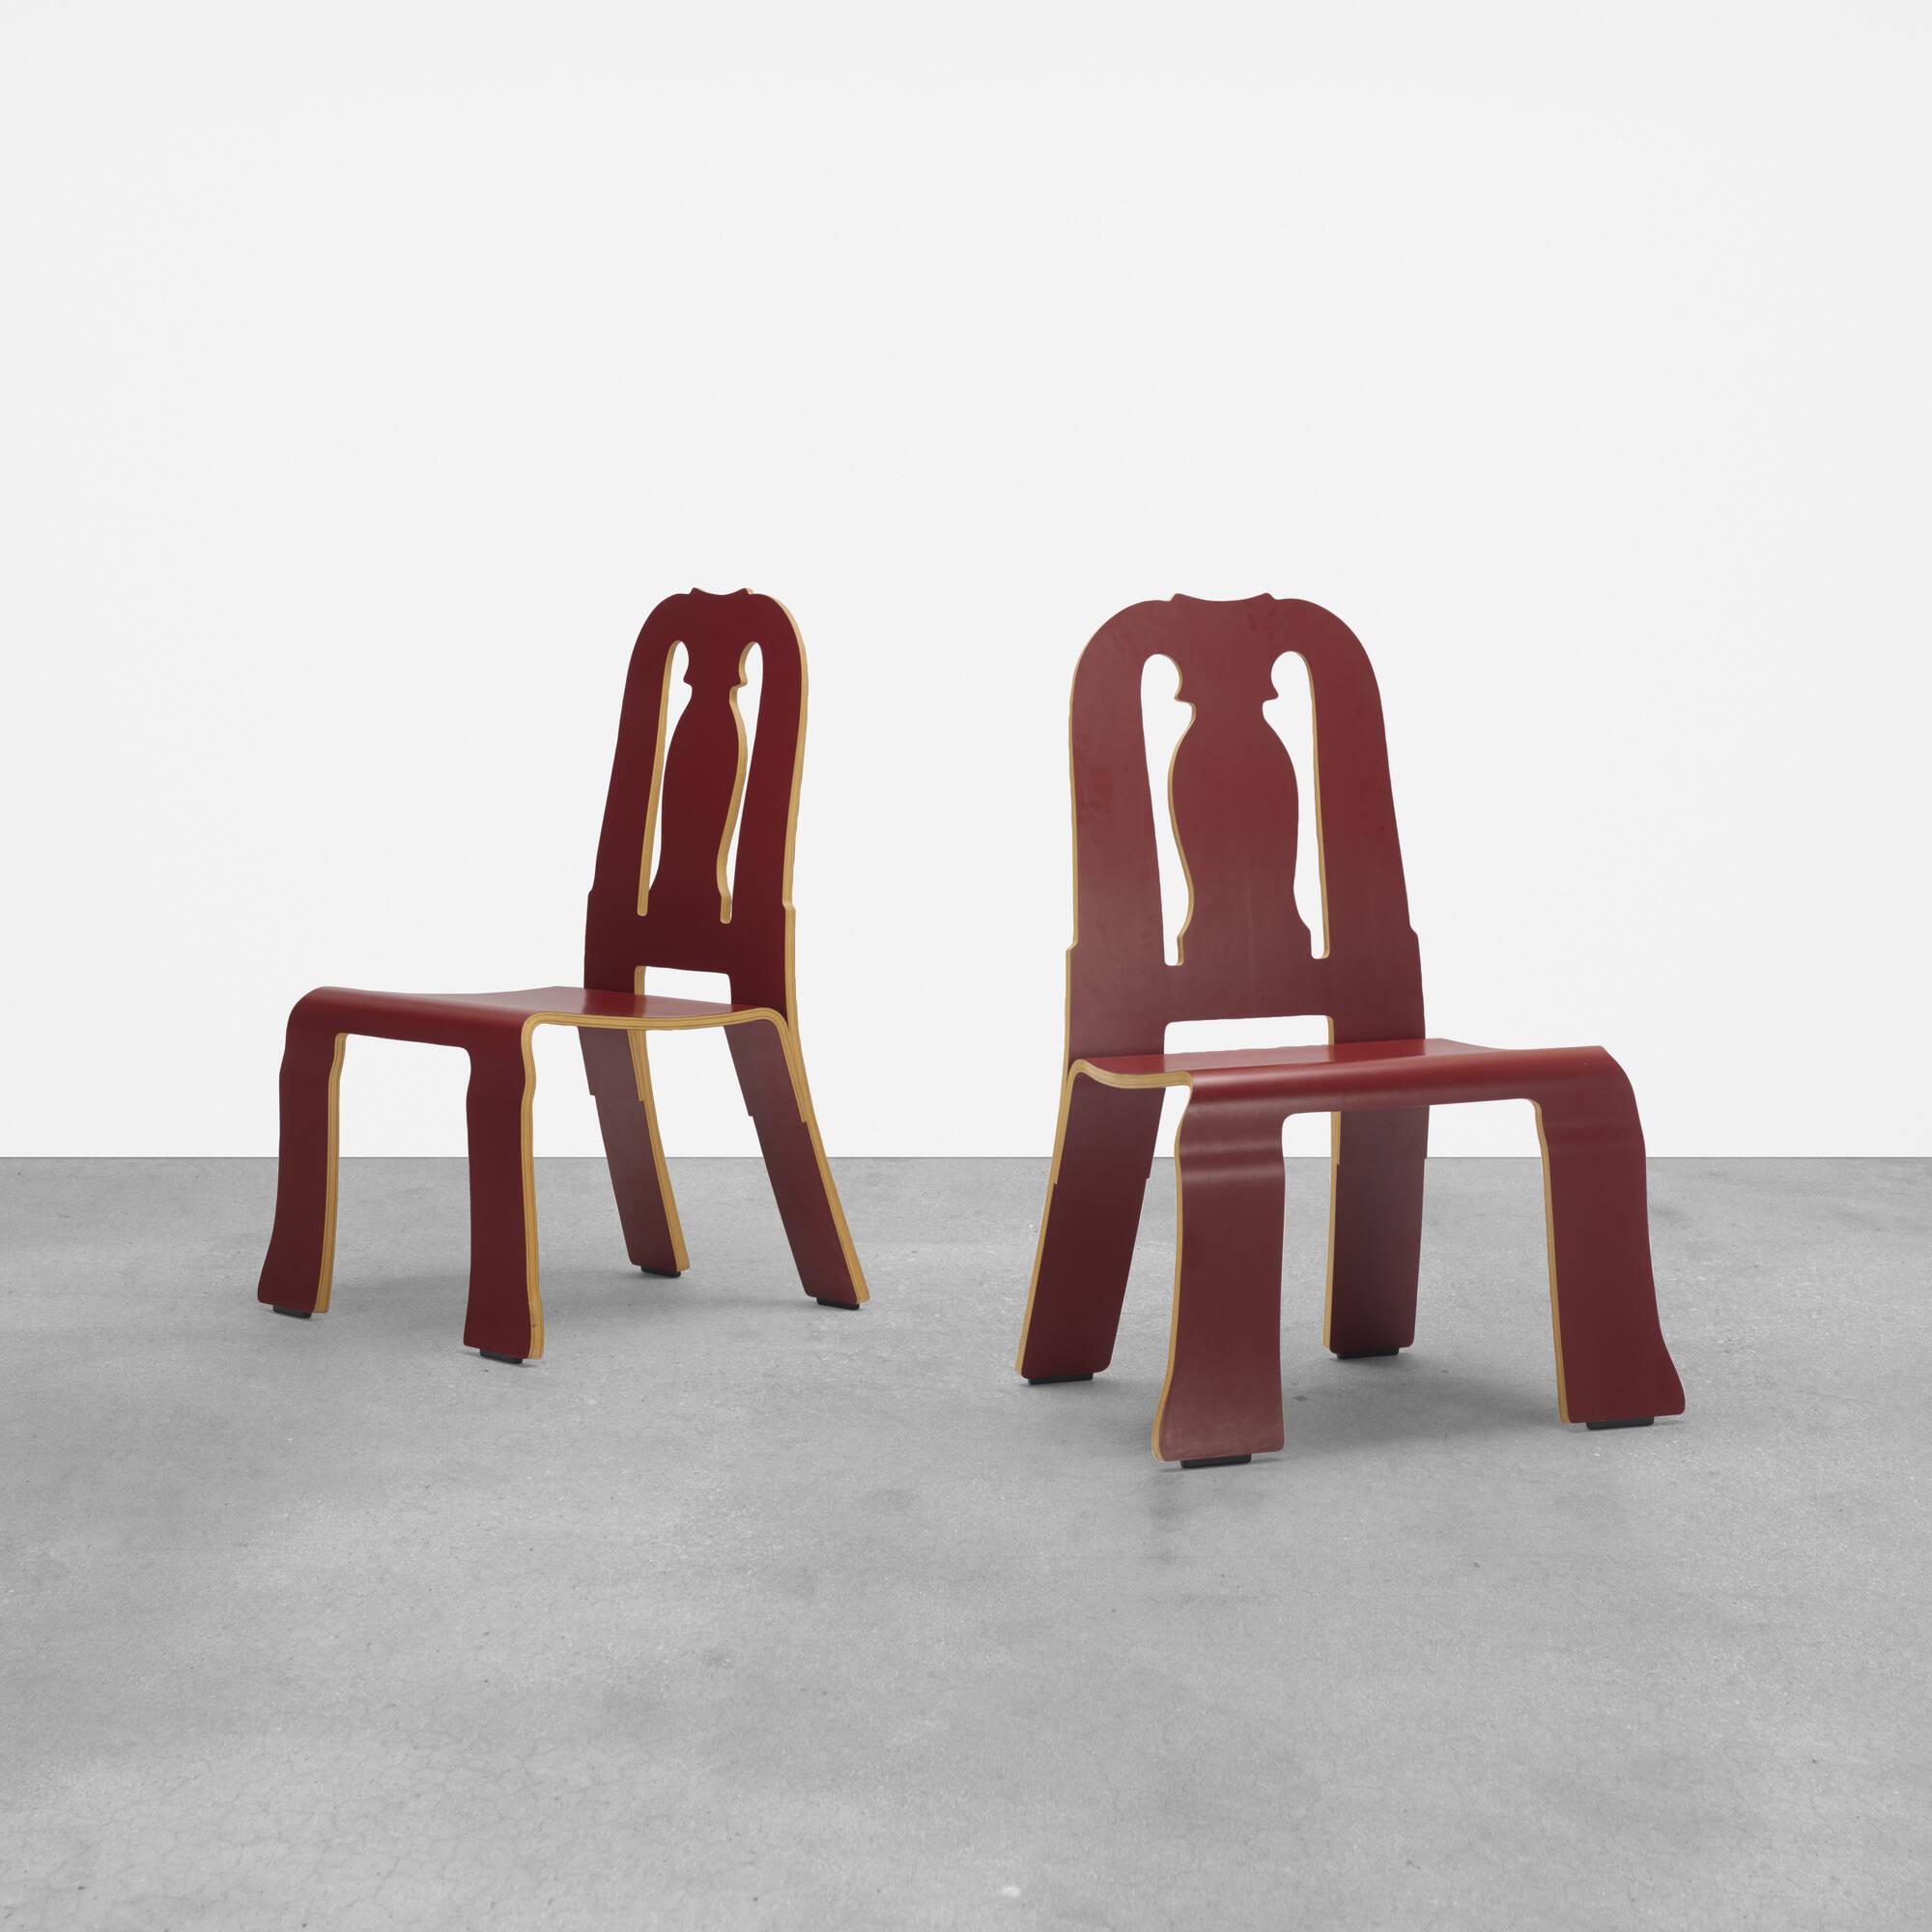 211: Robert Venturi with Denise Scott Brown / Queen Anne chairs, pair (1 of 3)